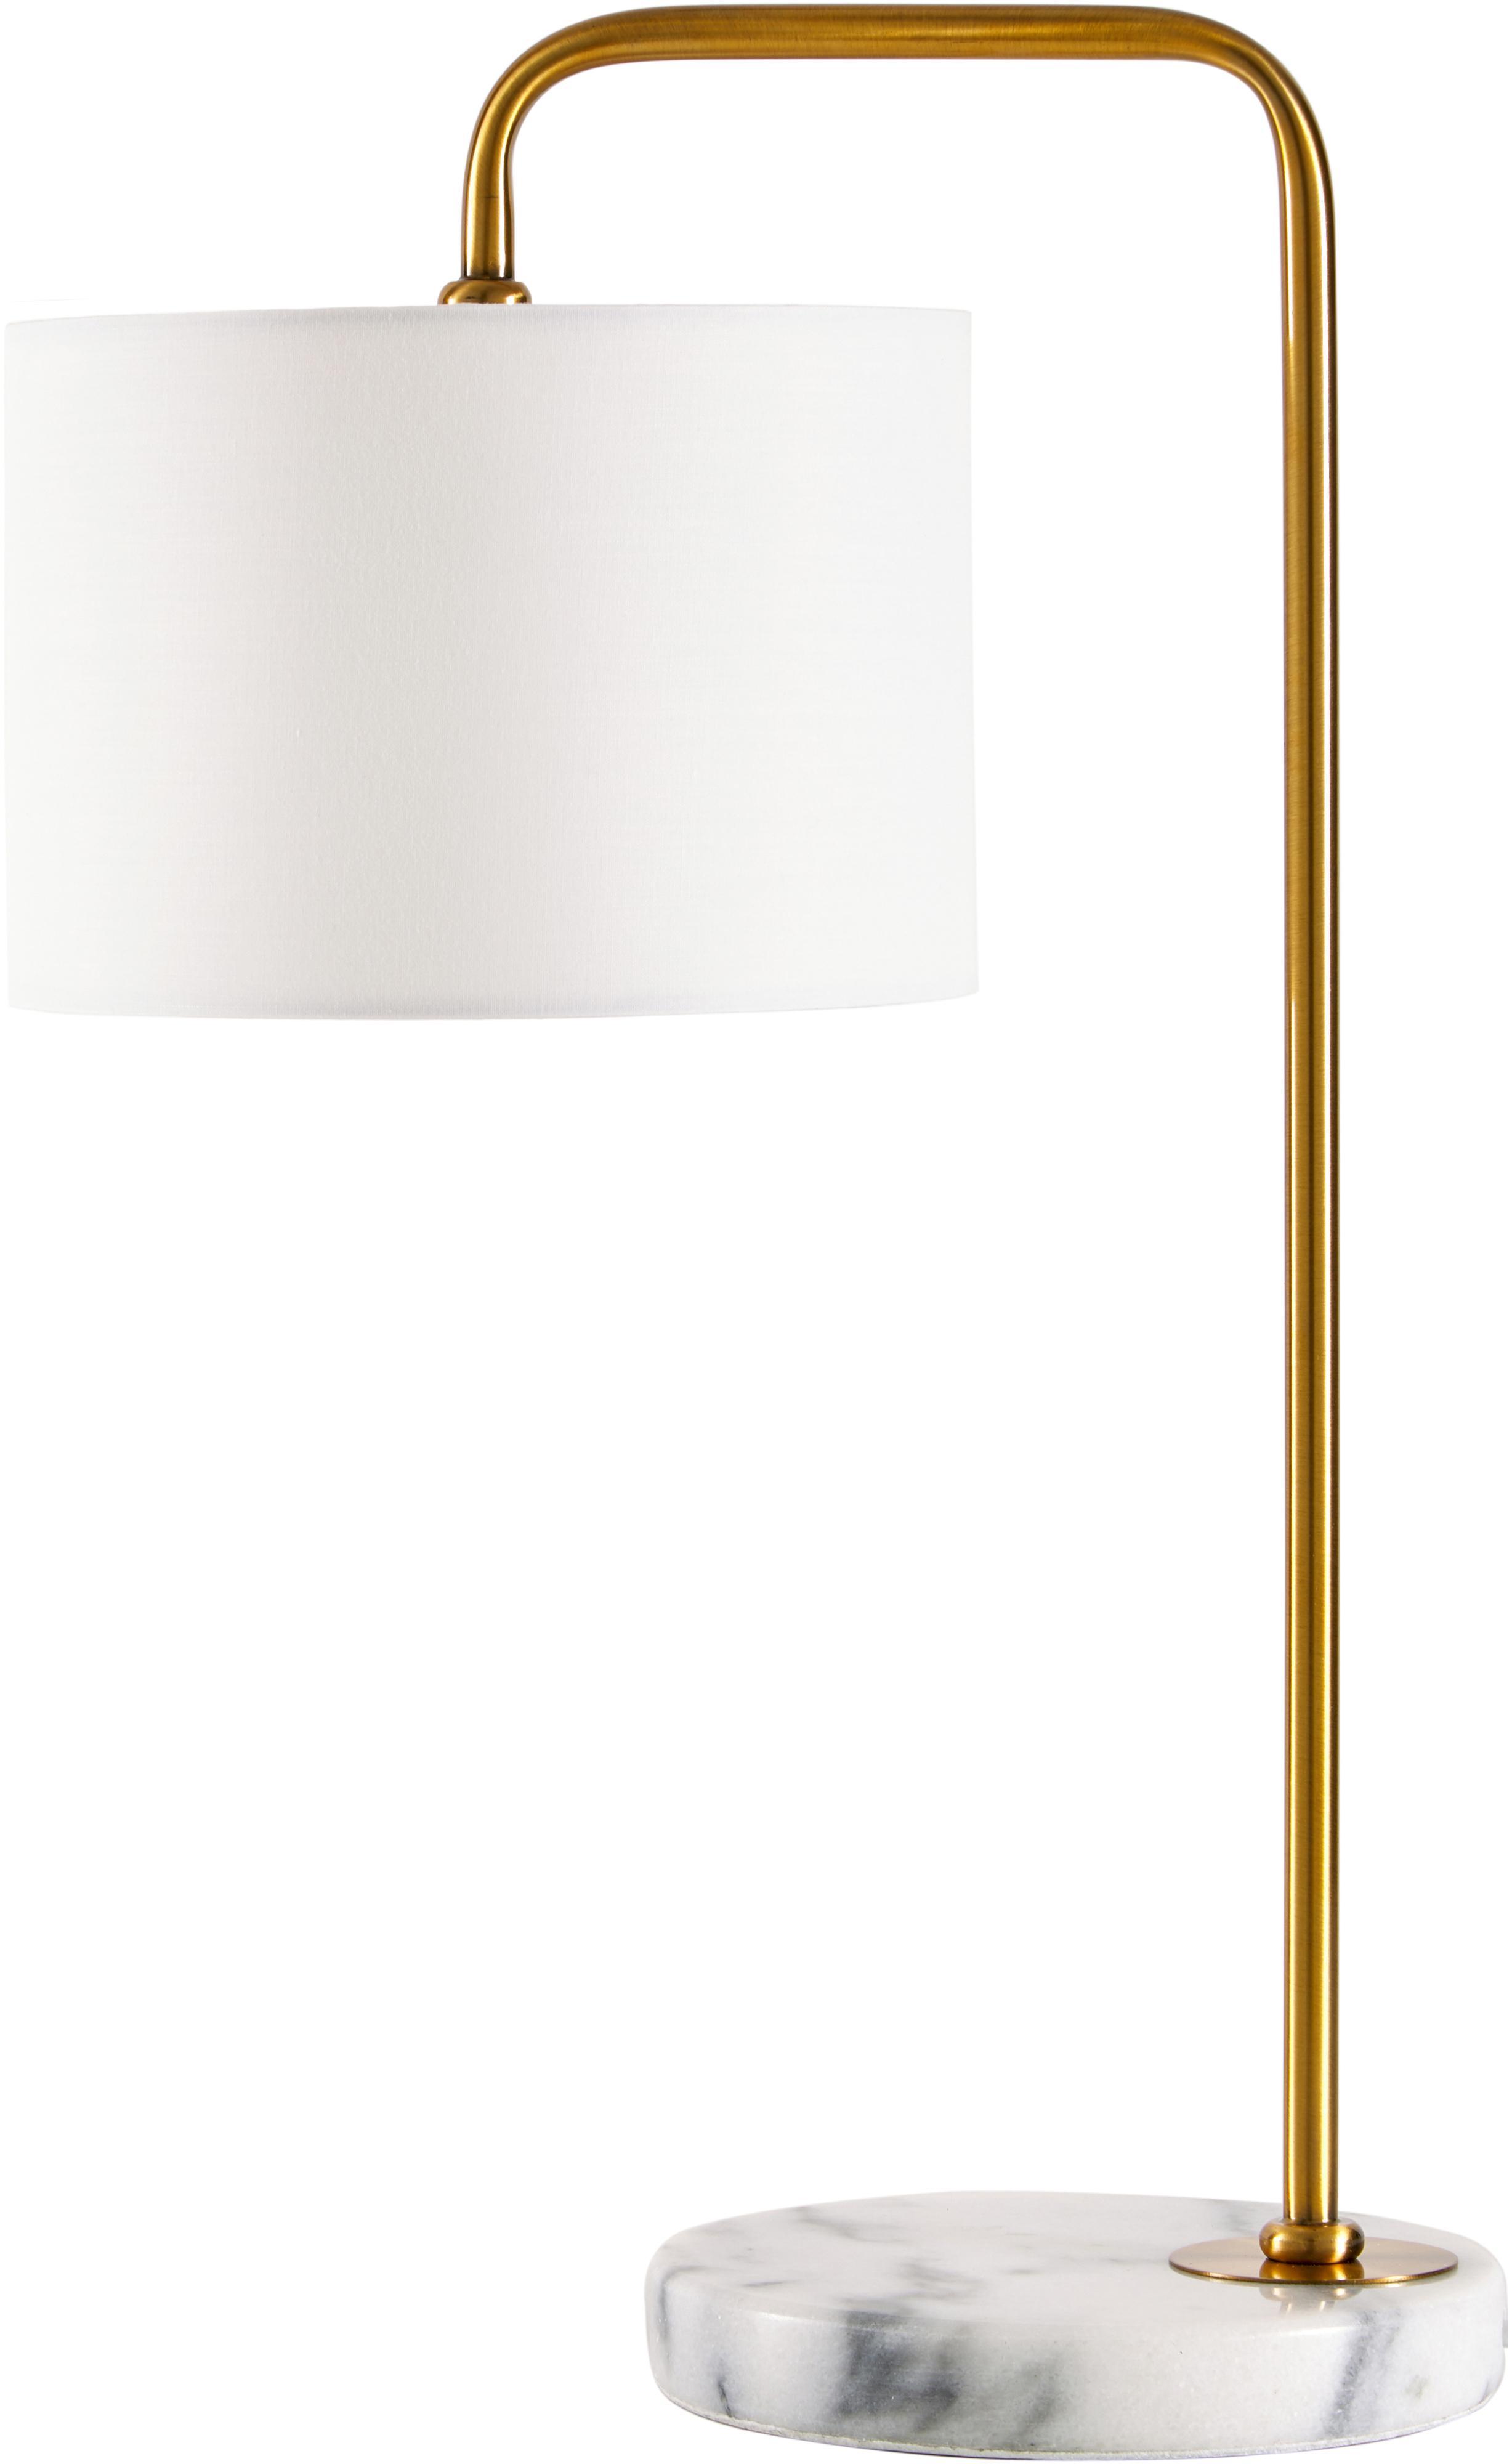 Tafellamp Montreal met marmeren voet, Lampenkap: textiel, Lampvoet: marmer, Frame: gegalvaniseerd metaal, Wit, goudkleurig, Ø 20 x H 49 cm